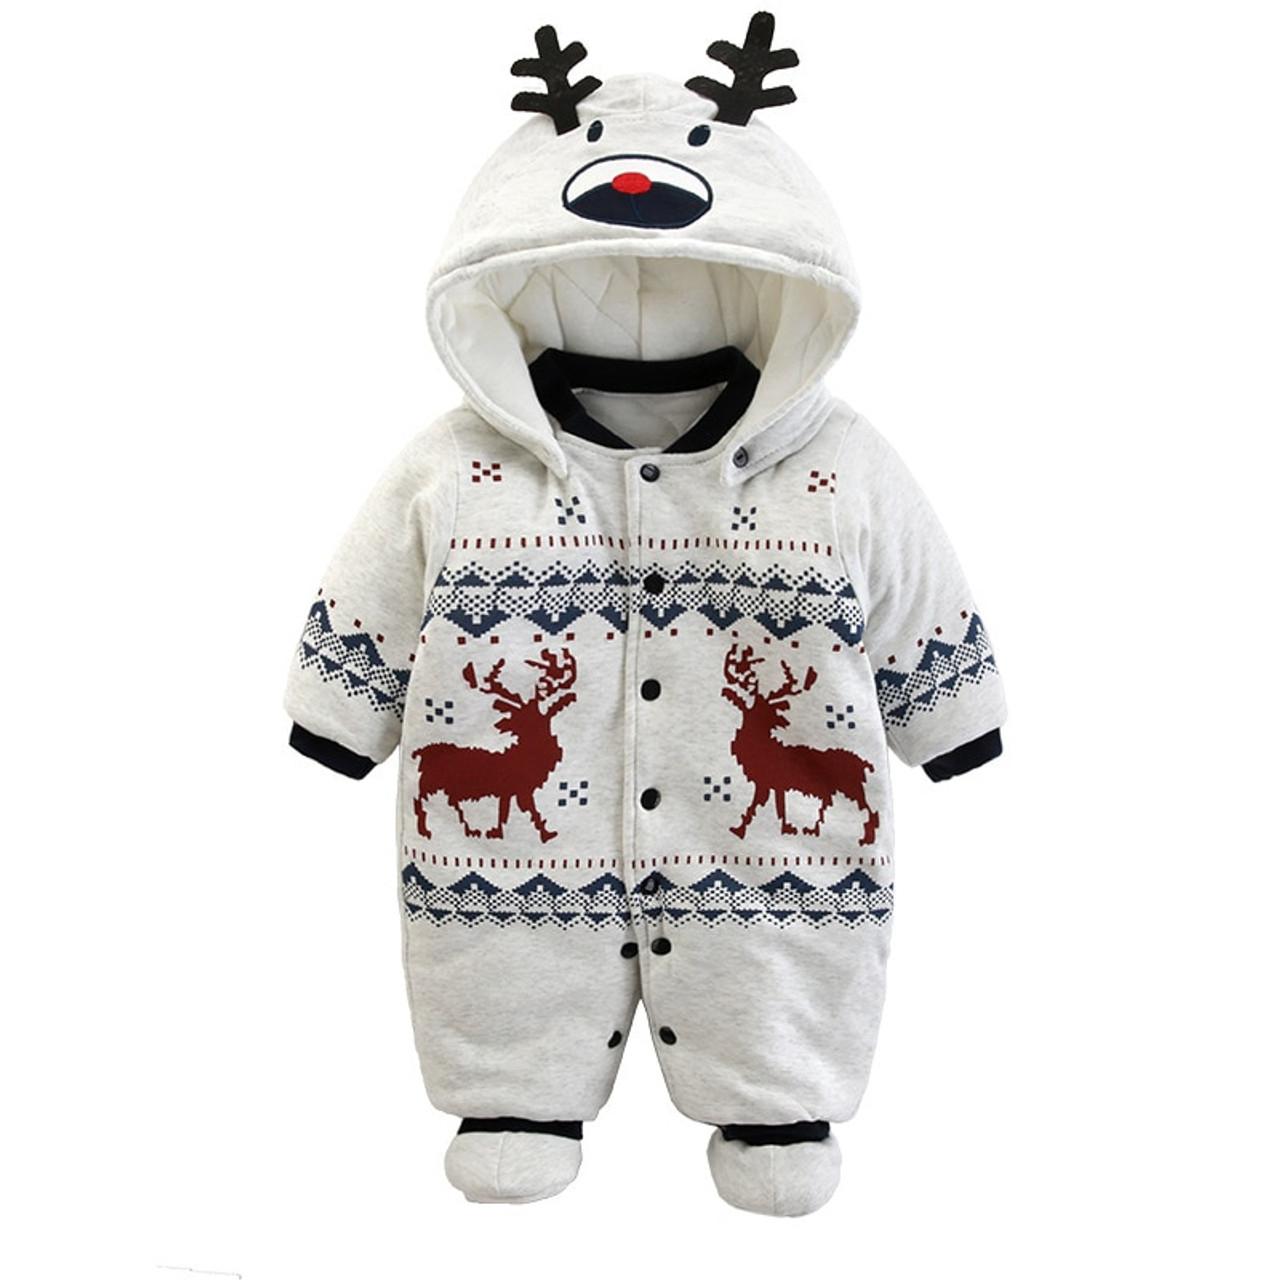 68e63faa0 Baby Rompers Winter Thick Warm fleece Hoodies baby girls boys ...